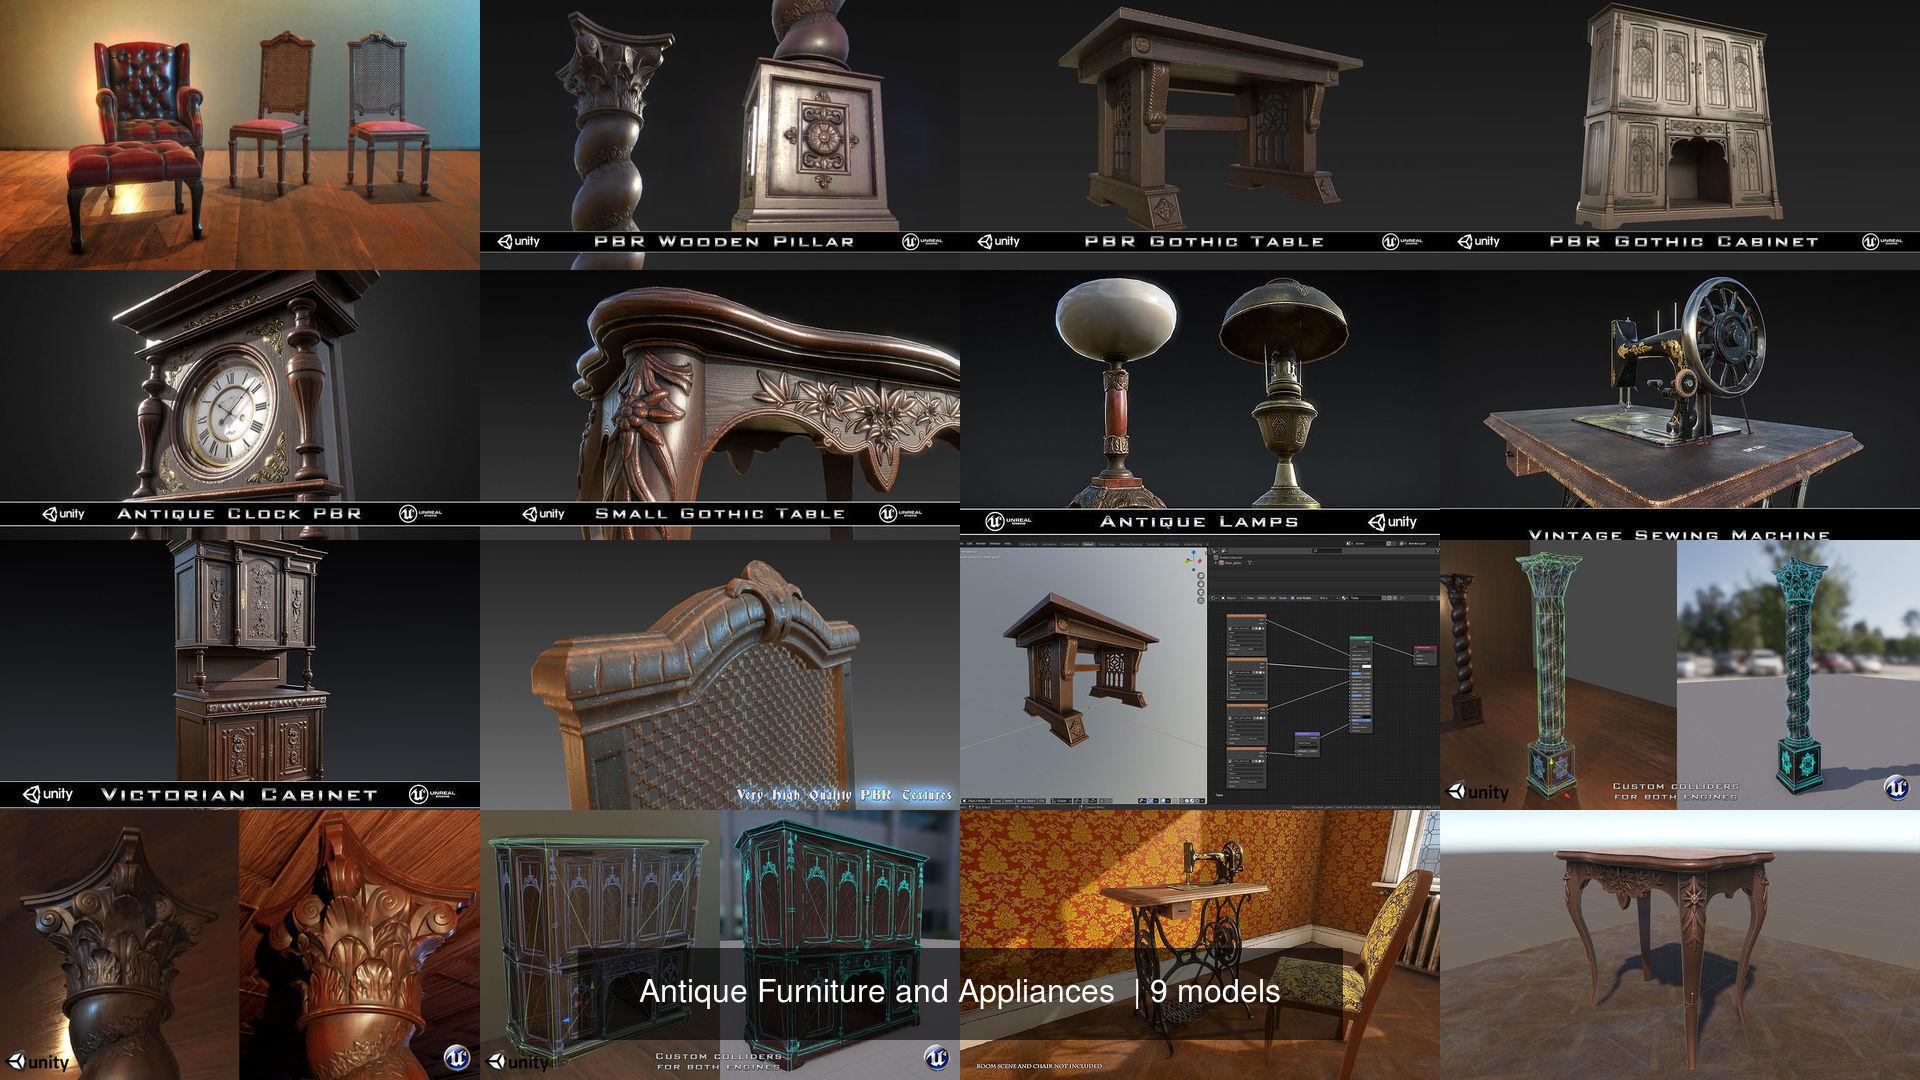 Antique Furniture and Appliances